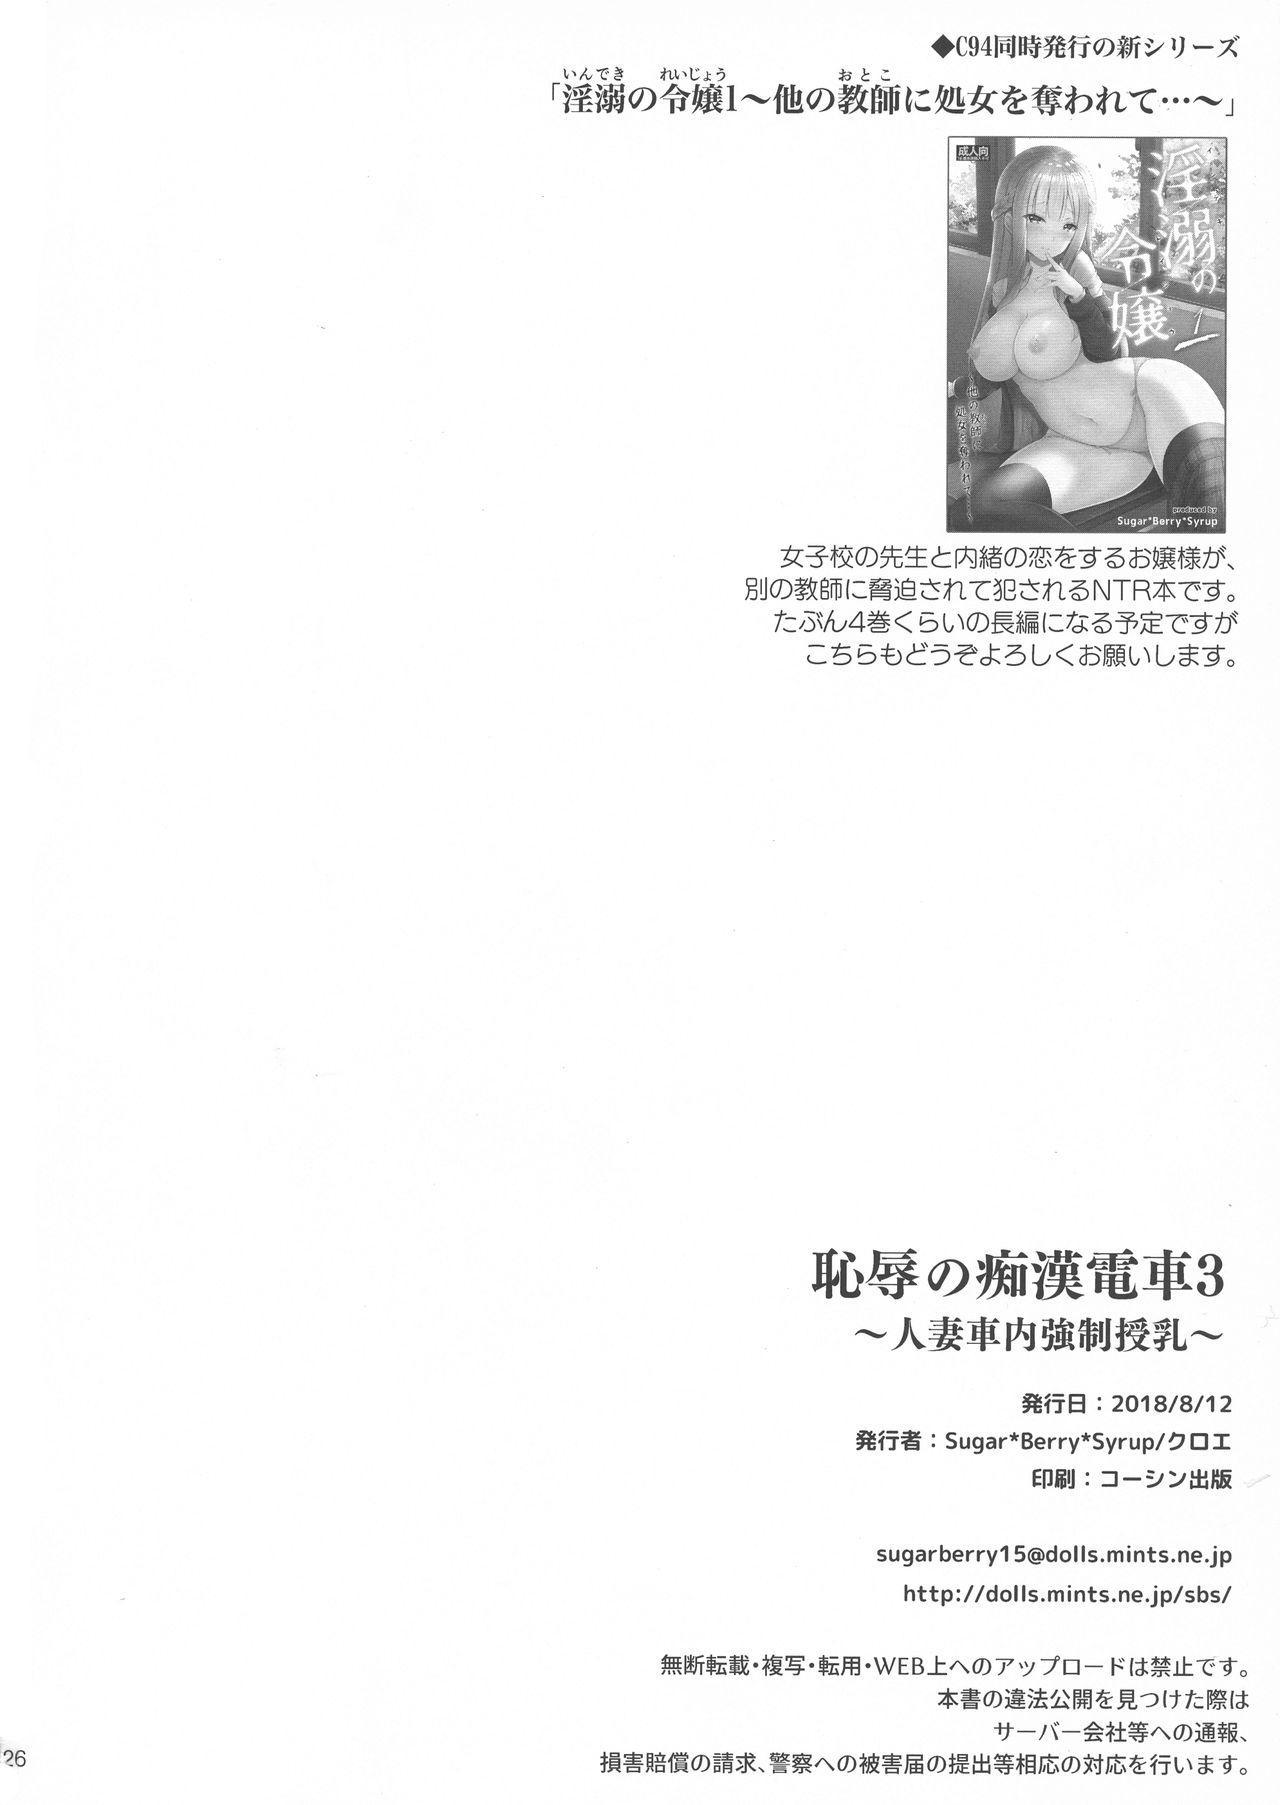 (C94) [Sugar*Berry*Syrup (Crowe)] Chijoku no Chikan Densha 3 ~ Hitozuma Shanai Kyousei Junyuu ~ | Shameless Train Molester 3 ~ Forcing a Married Woman to Breastfeed in the Train ~ [English] [The Chrysanthemum Translations] 25